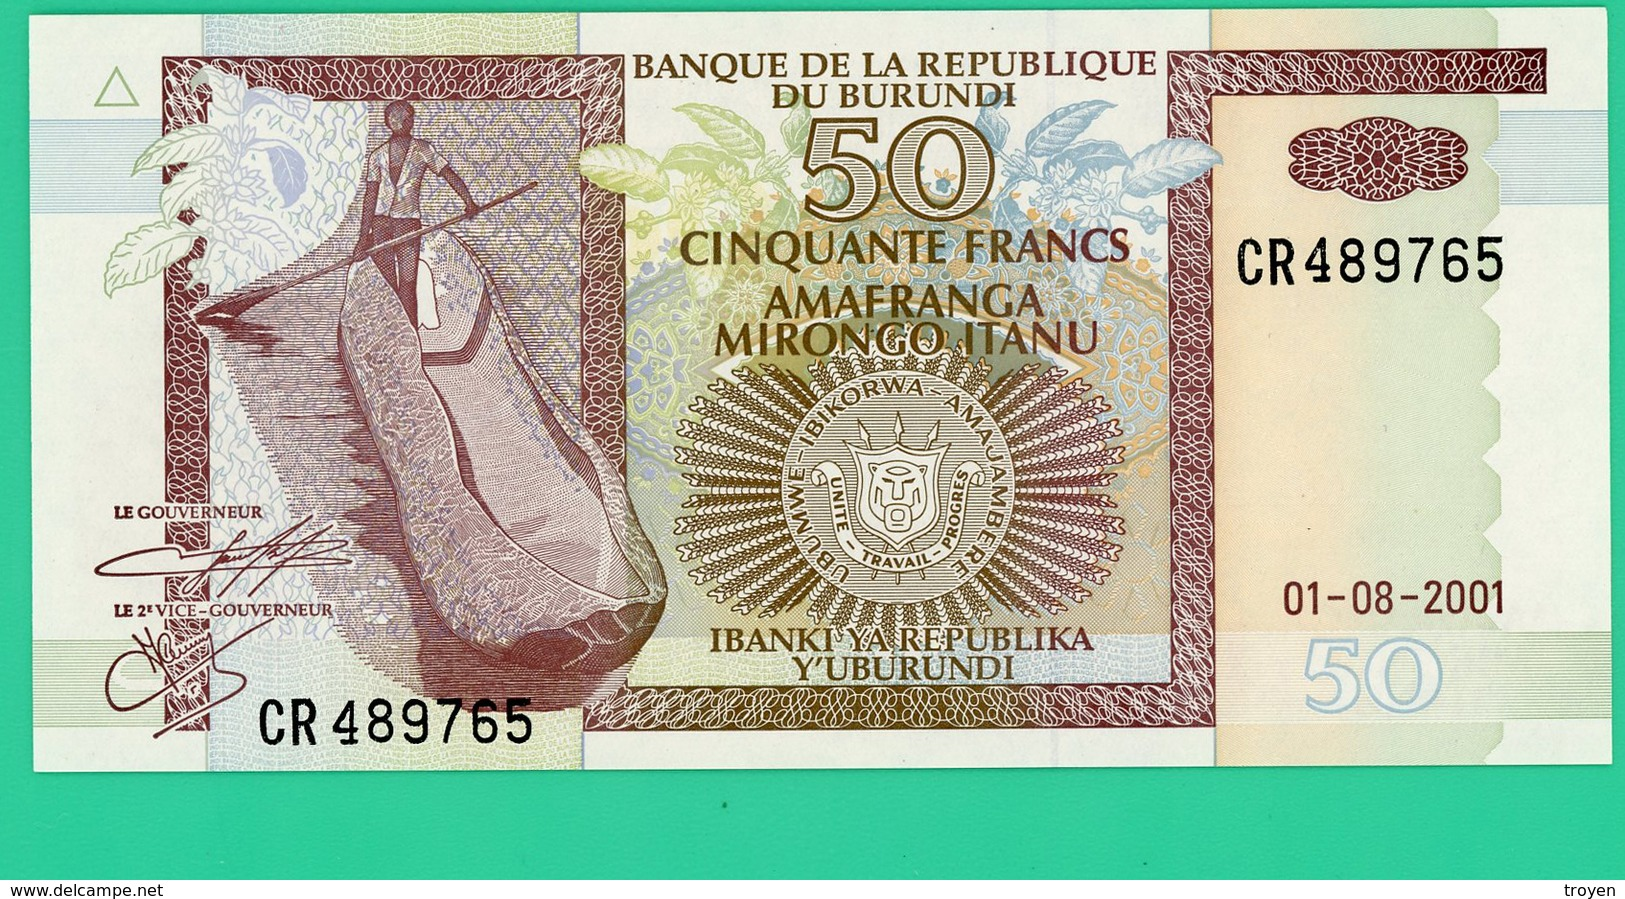 50 Francs - Burundi - 2001 - N° CR 489765 -  Neuf - - Burundi